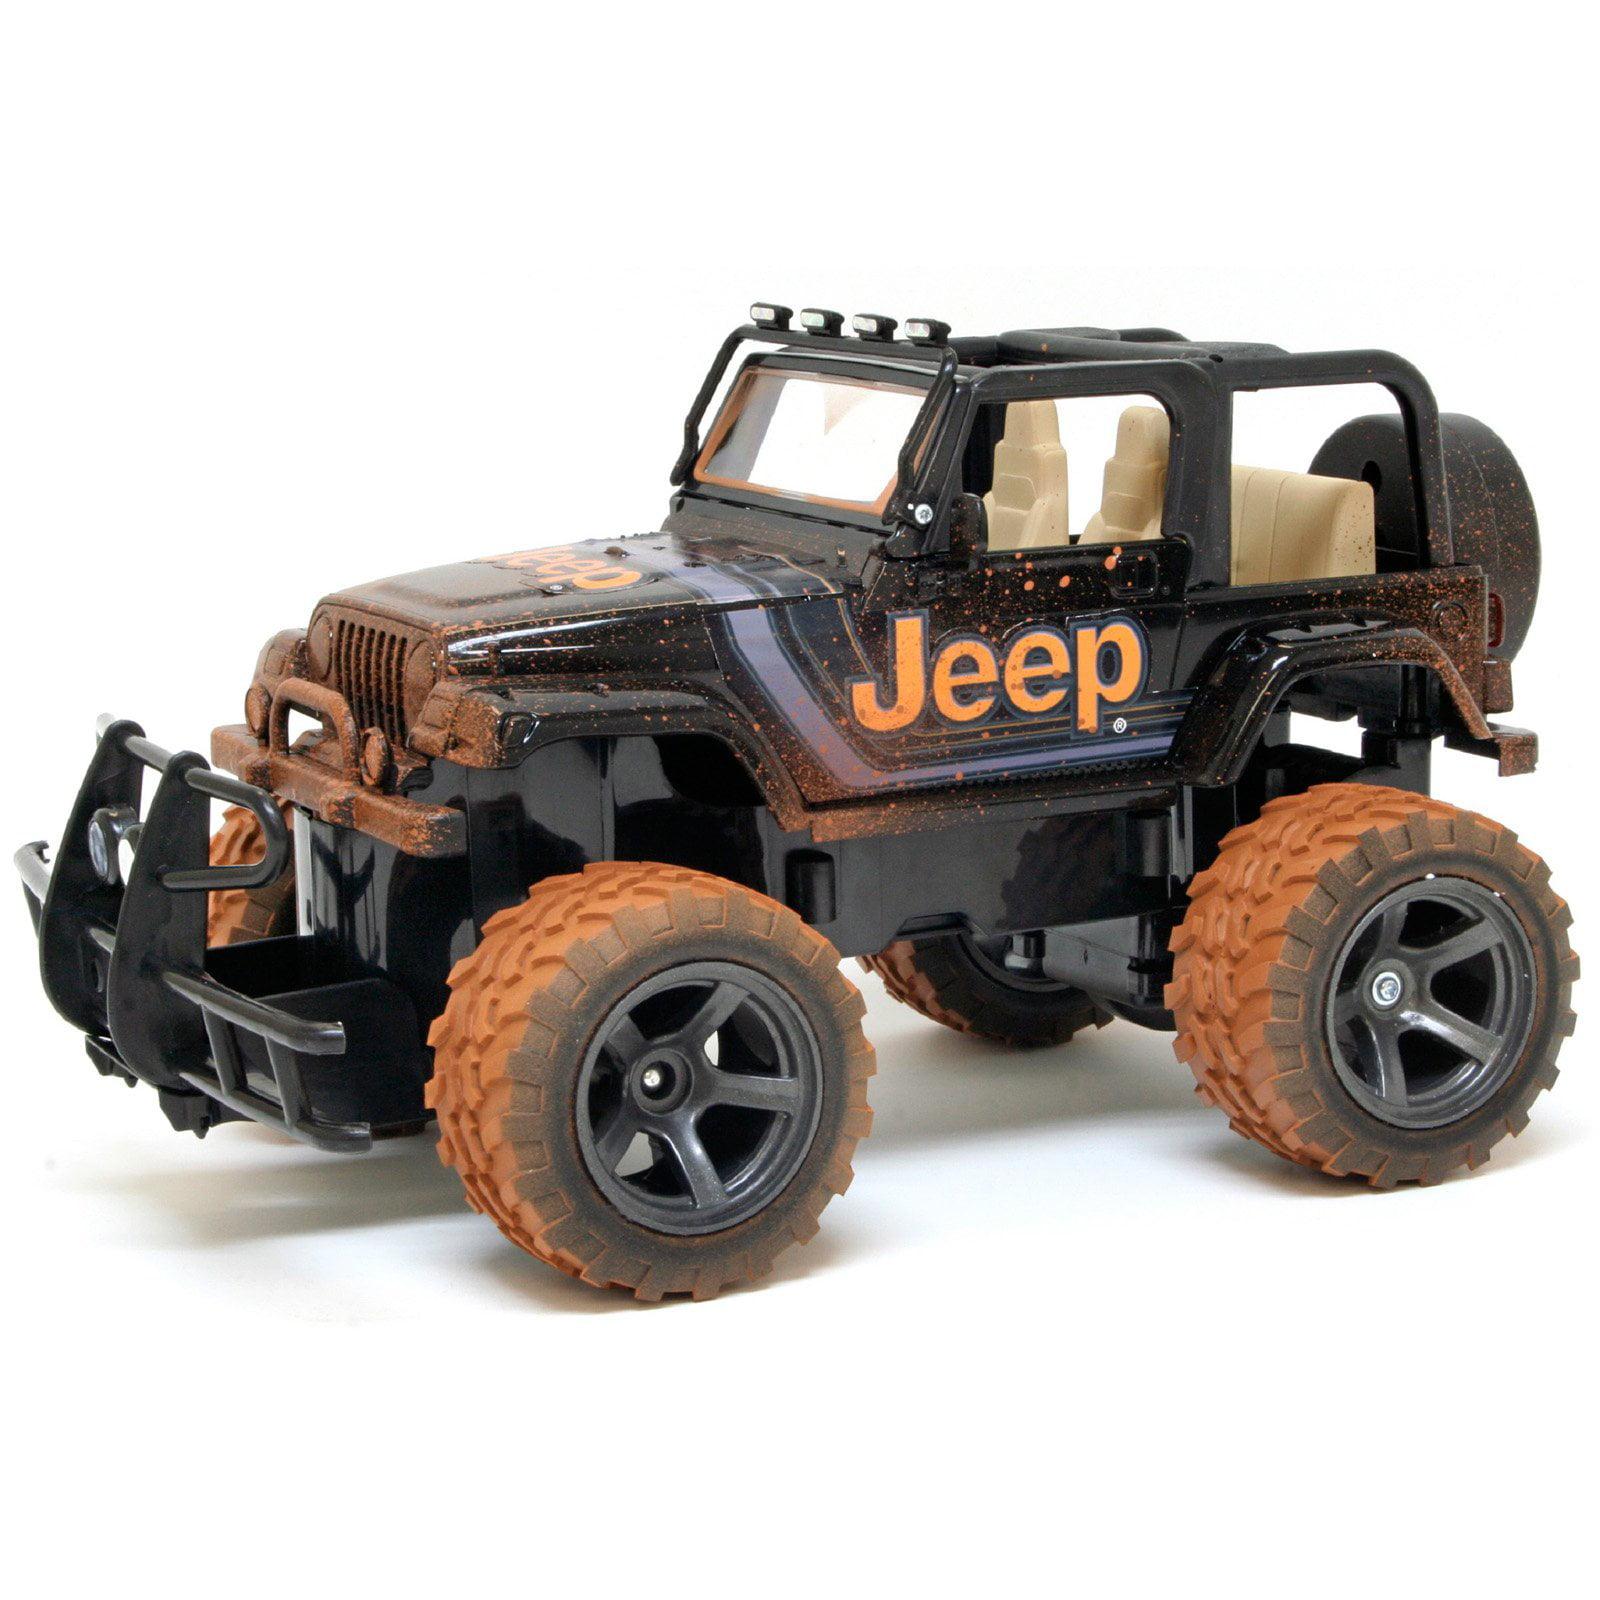 New Bright 1:15 Radio Control Full-Function Mud Slinger Jeep, Black